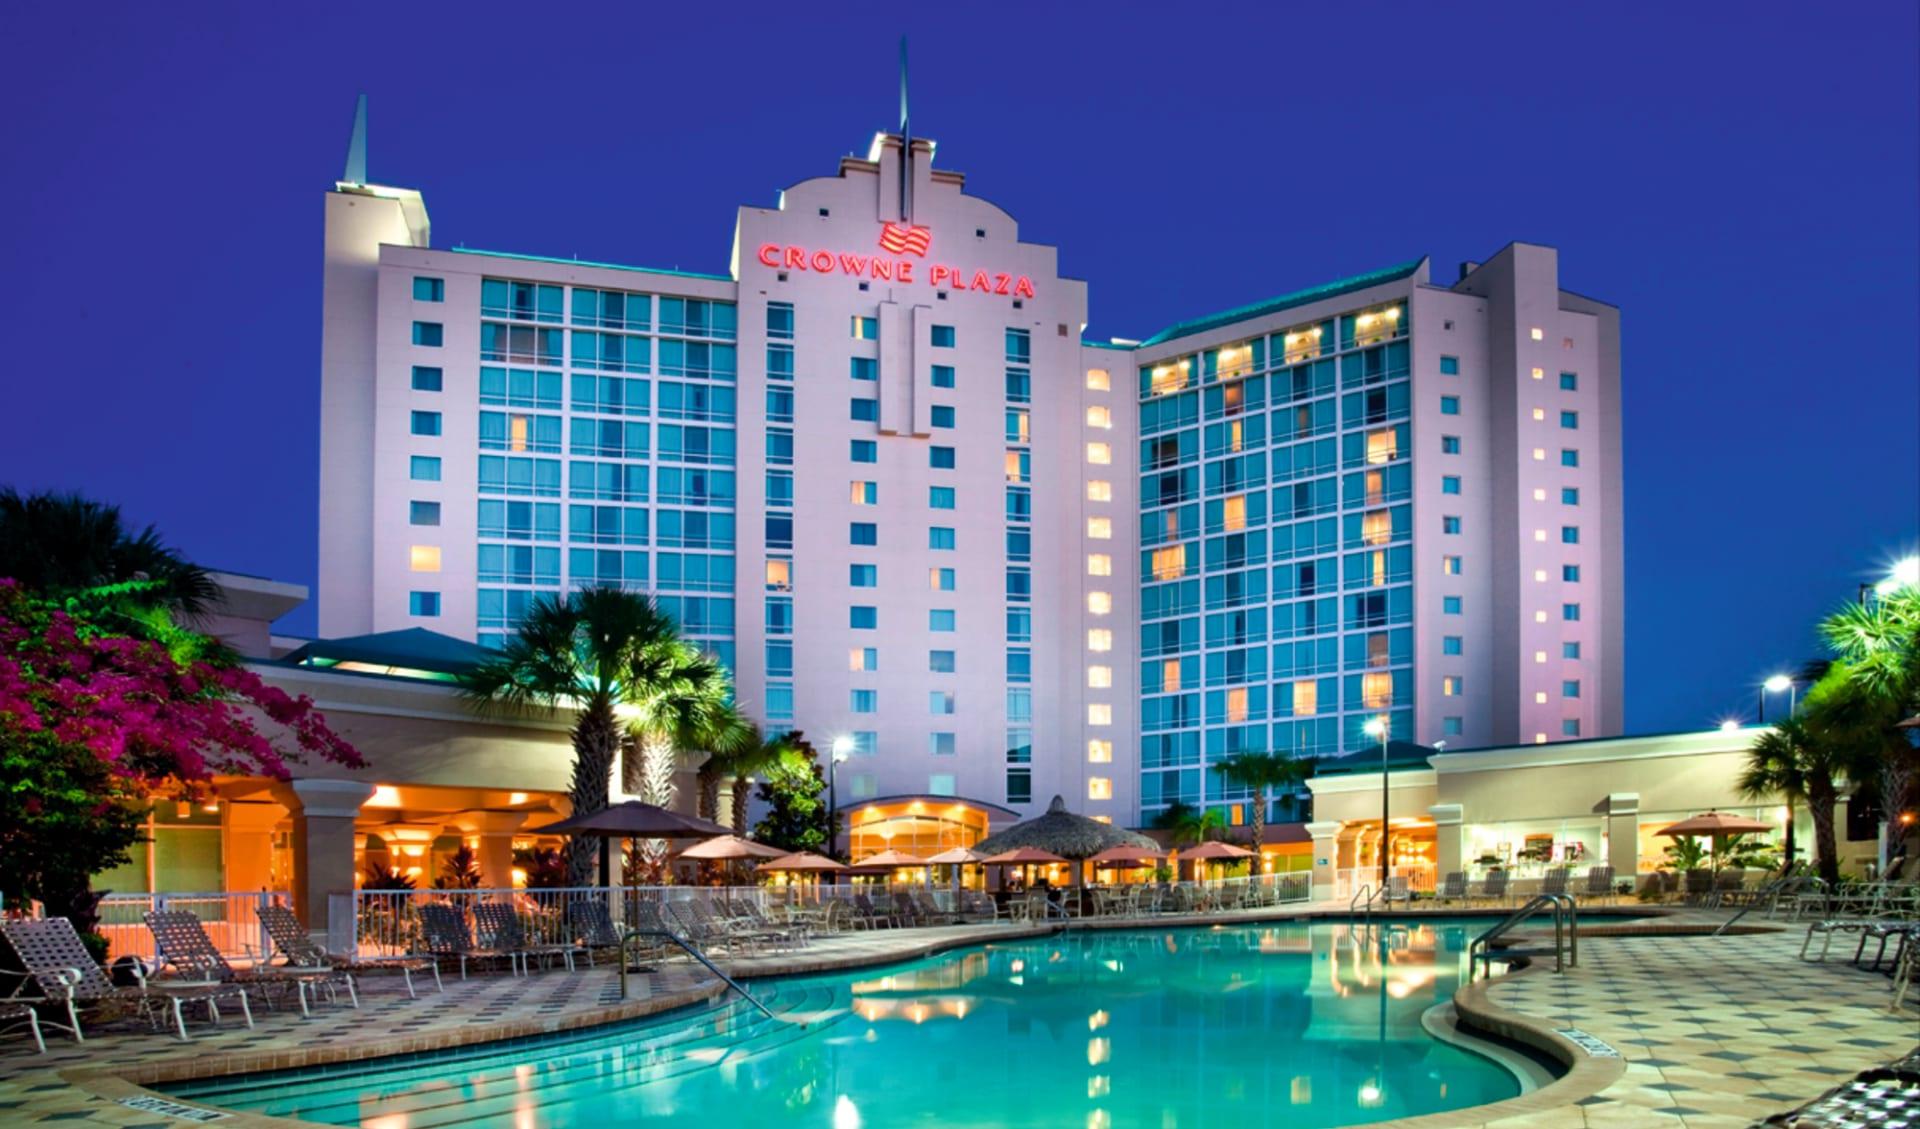 Crowne Plaza in Orlando:  Crowne Plaza MCO - Hotelansicht mit Pool